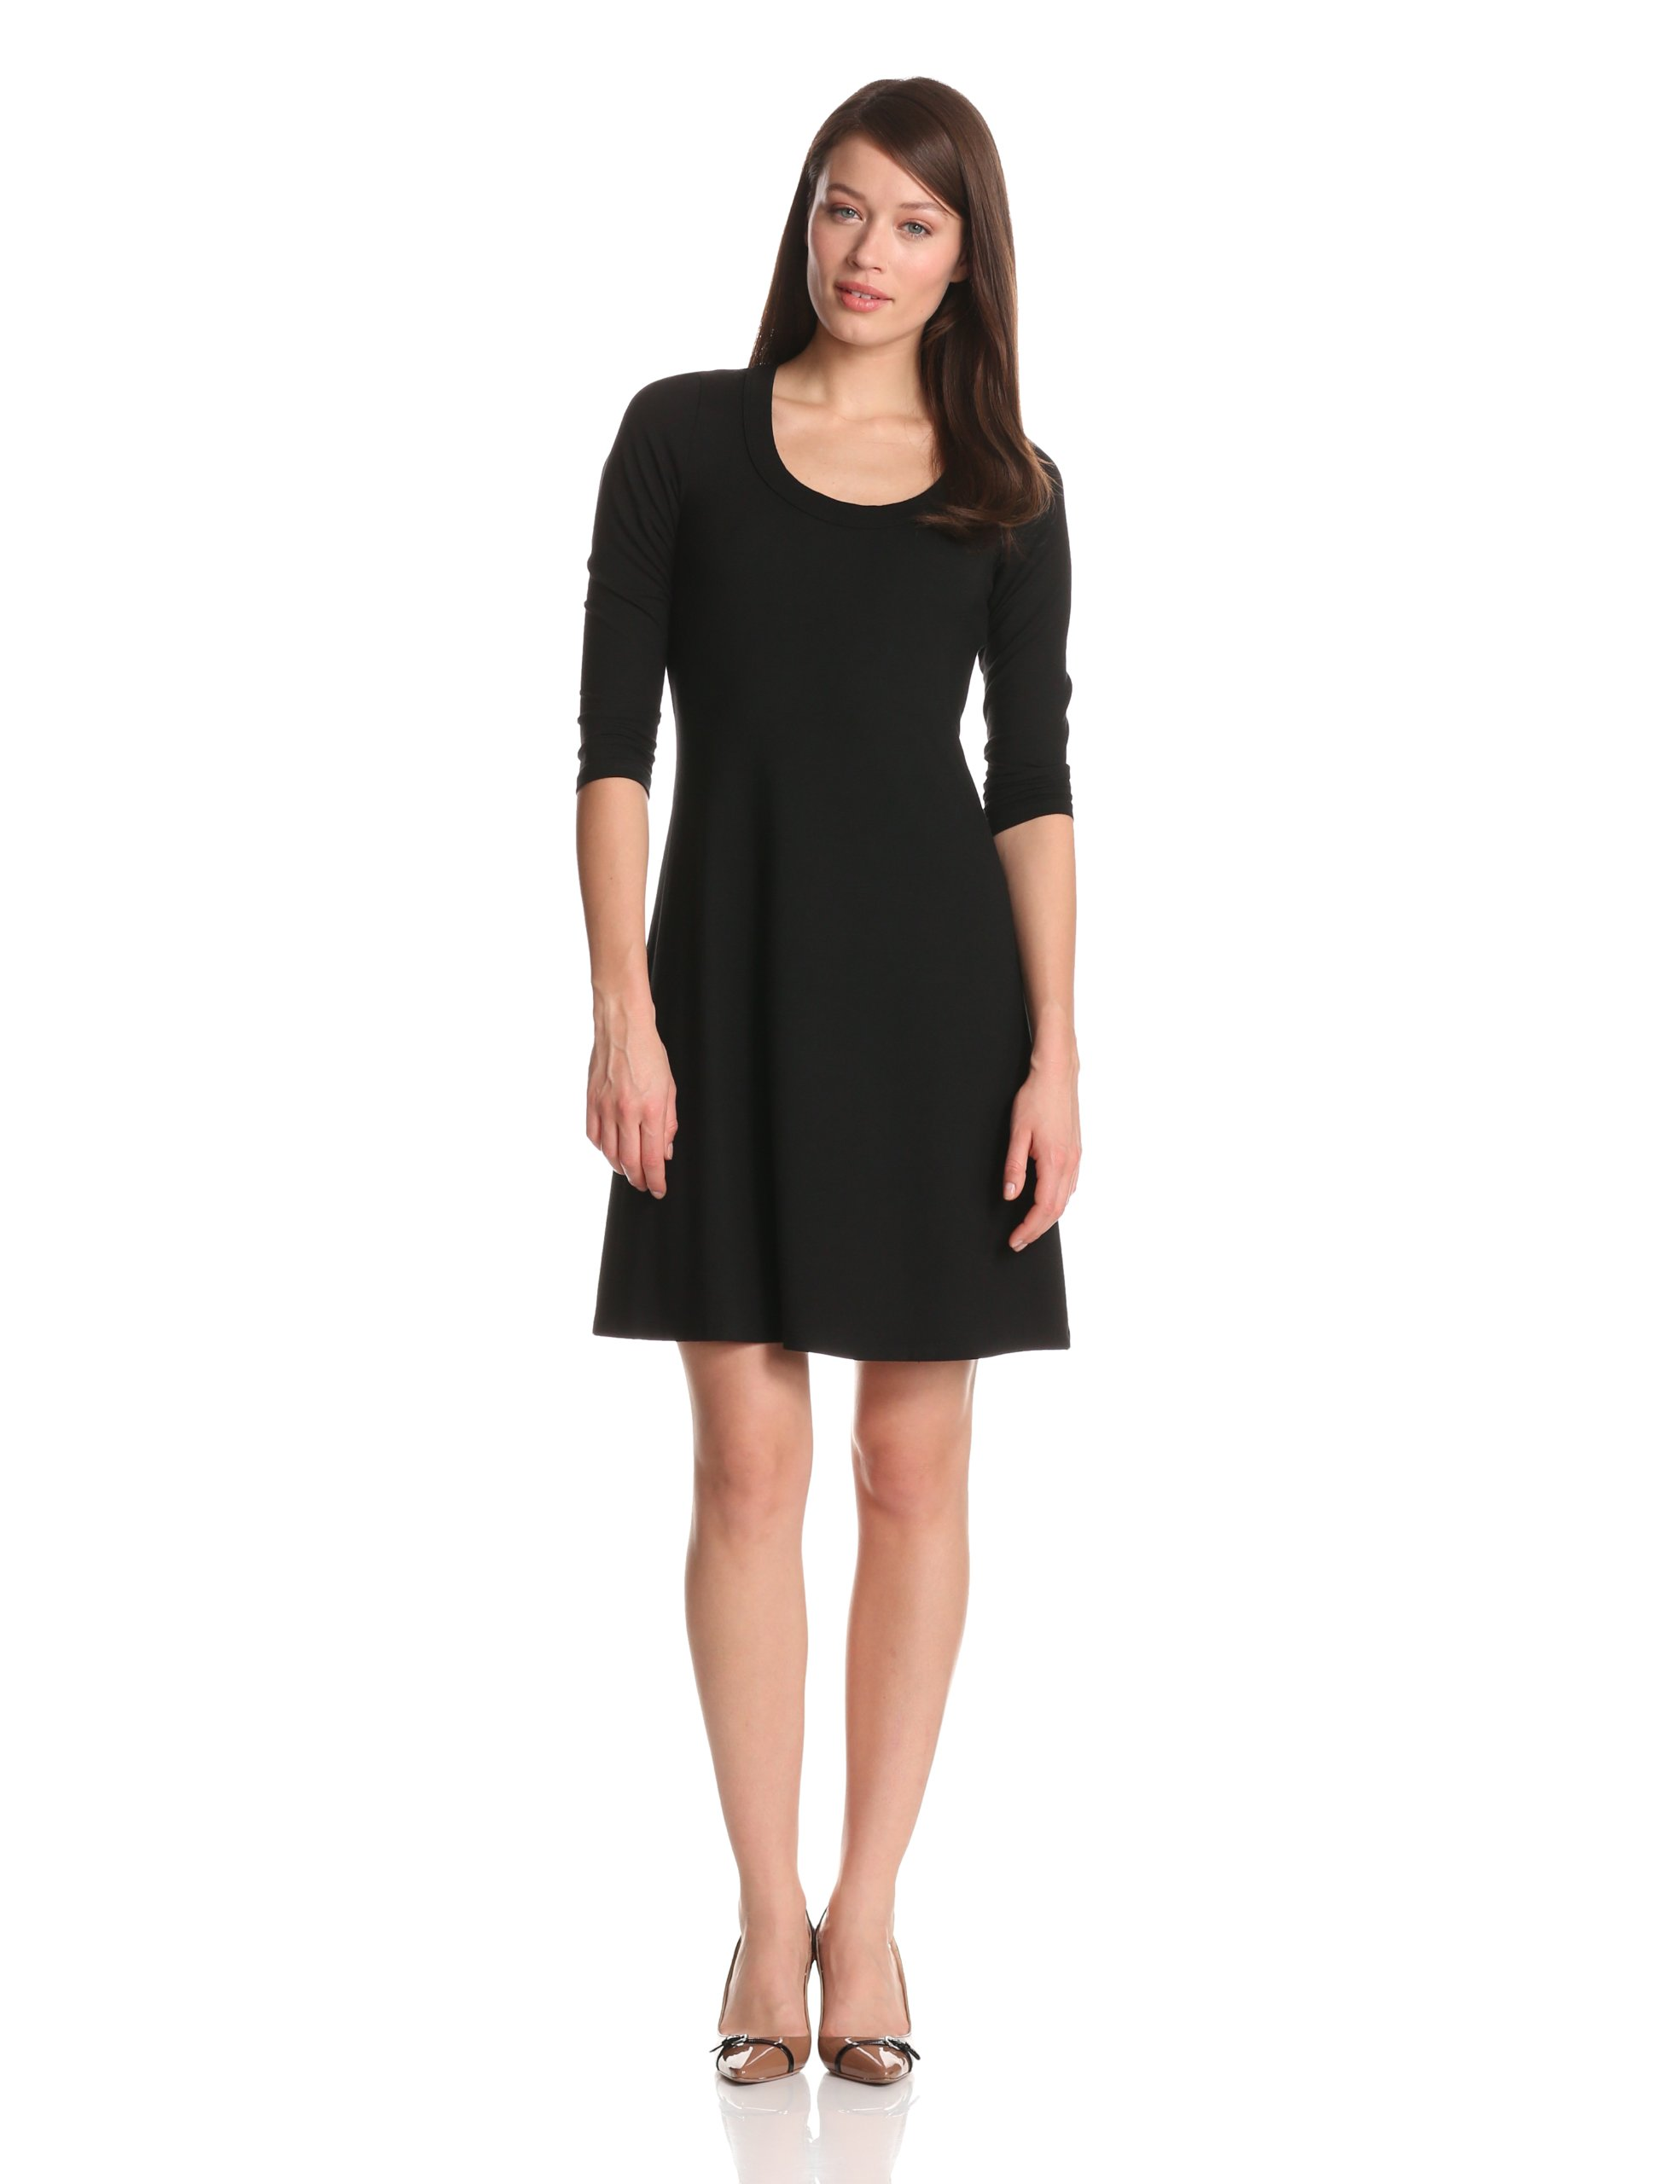 Karen Kane Women's 3/4 Sleeve A-Line Dress, Black, X-Large